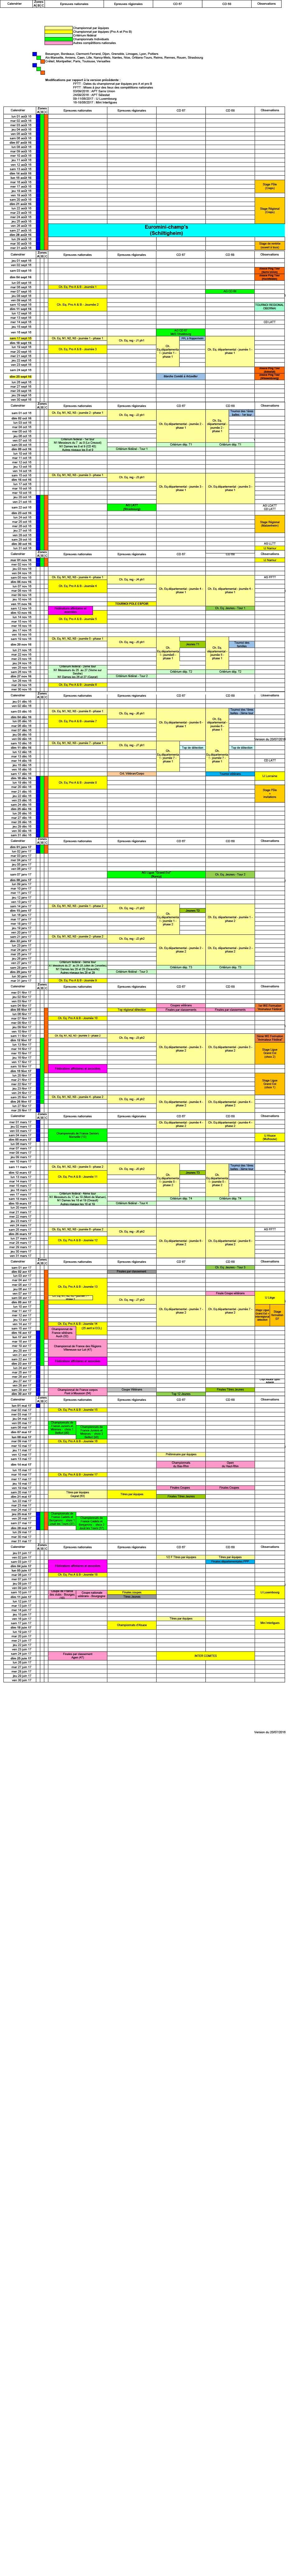 LATT Calendrier-2016-2017-1